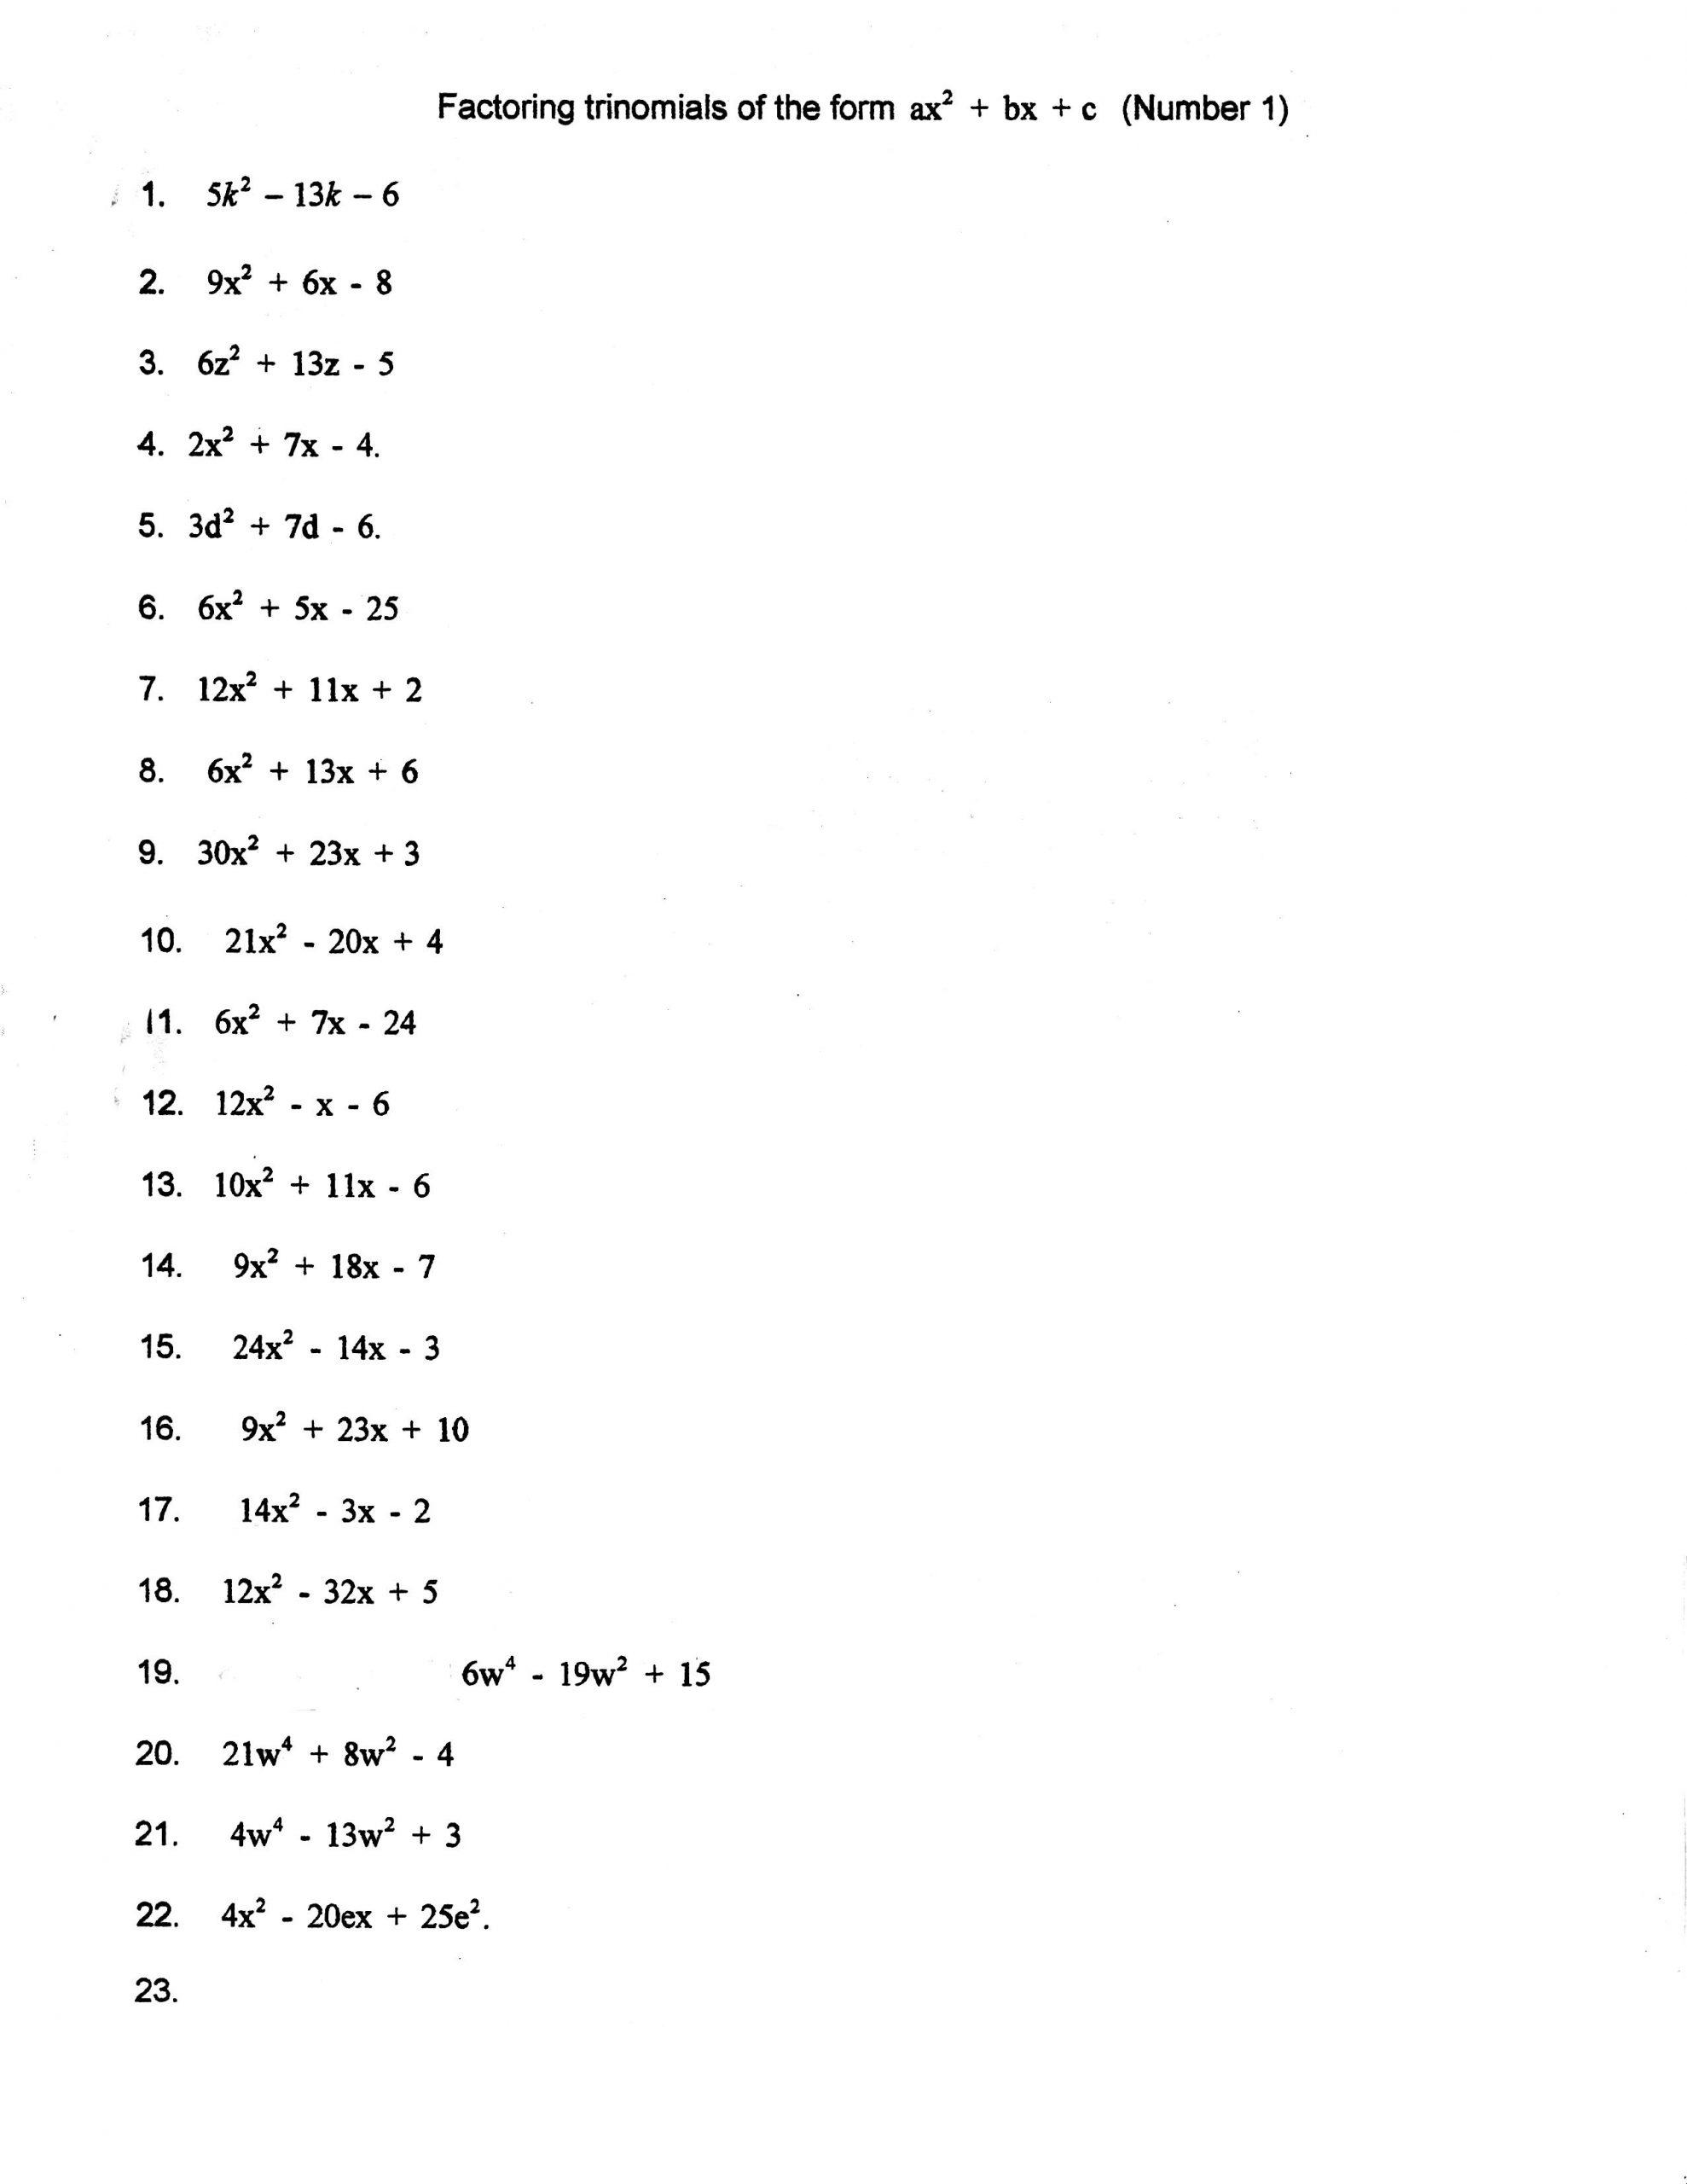 Factoring Trinomials Worksheet Algebra 2 Factoring Trinomials Trial and Error Worksheet